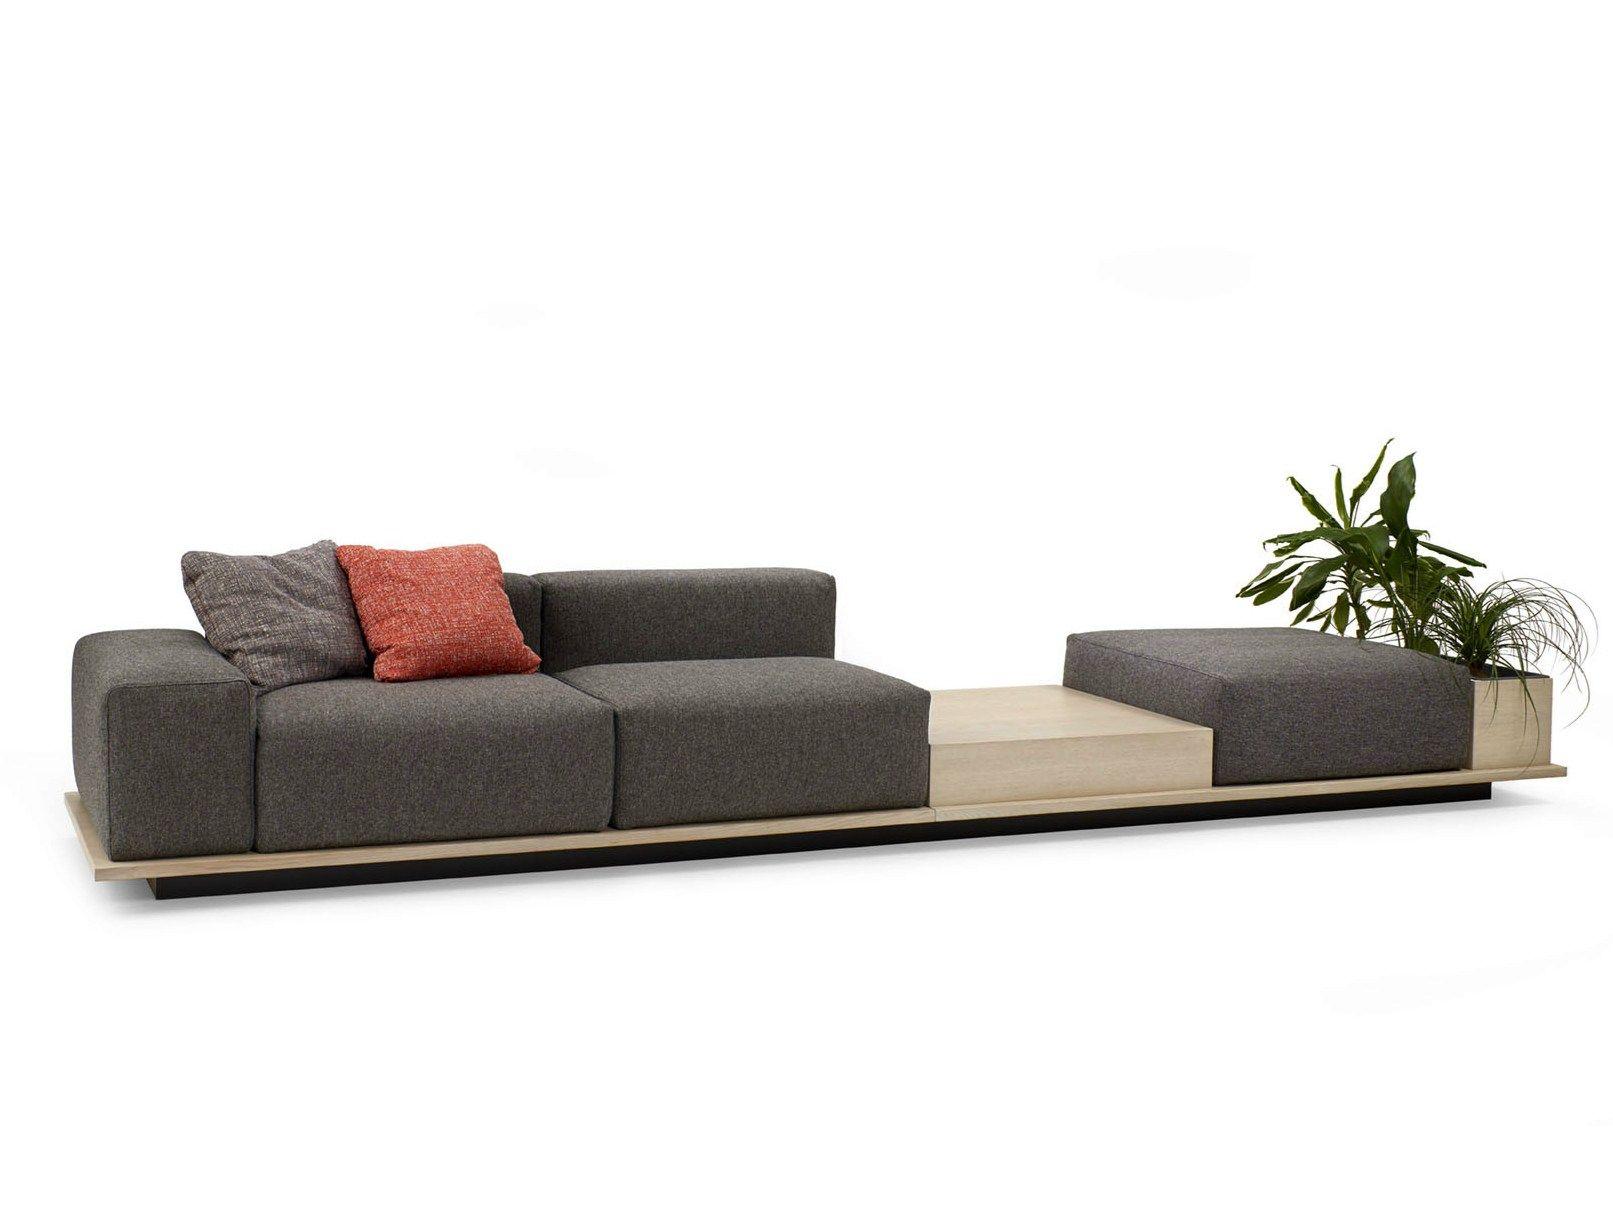 d coration canape modulable robin 19 clermont ferrand canape modulable robin canape. Black Bedroom Furniture Sets. Home Design Ideas